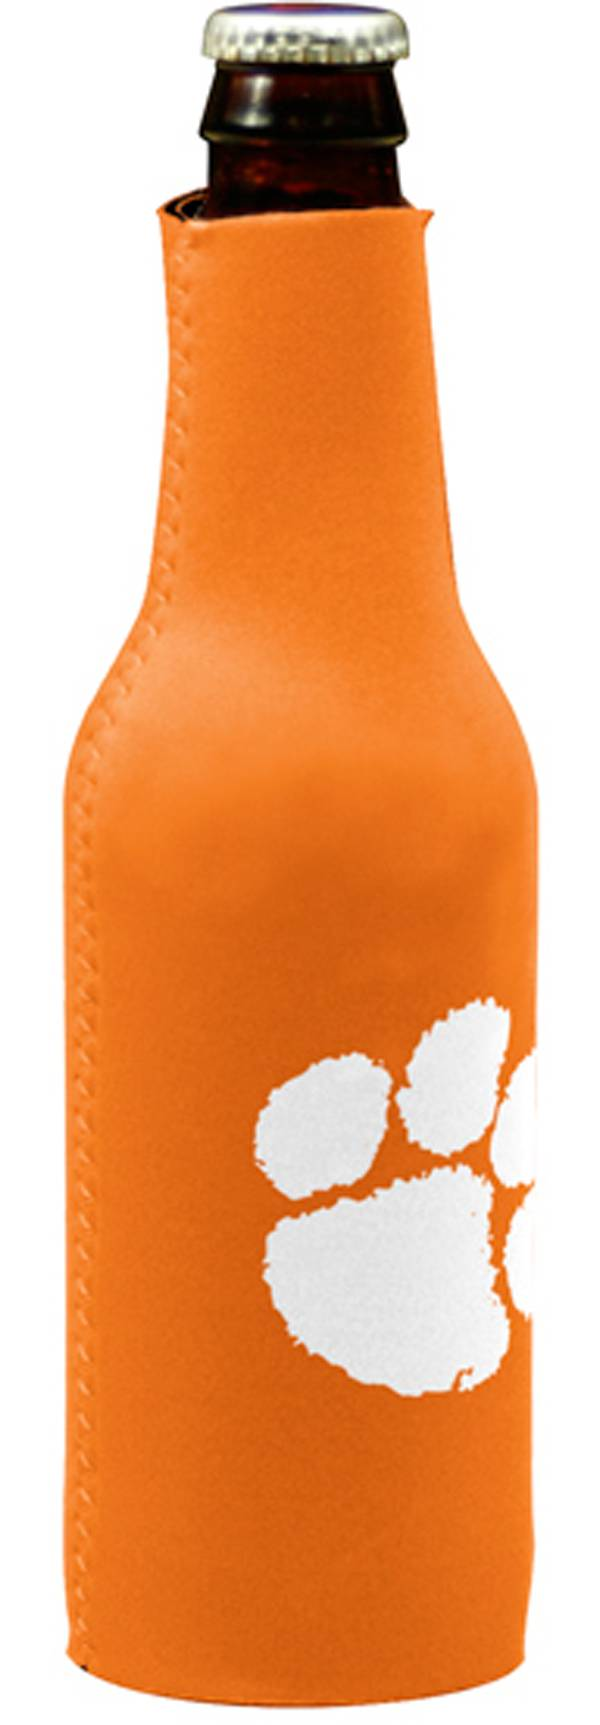 Clemson Tigers Bottle Koozie product image